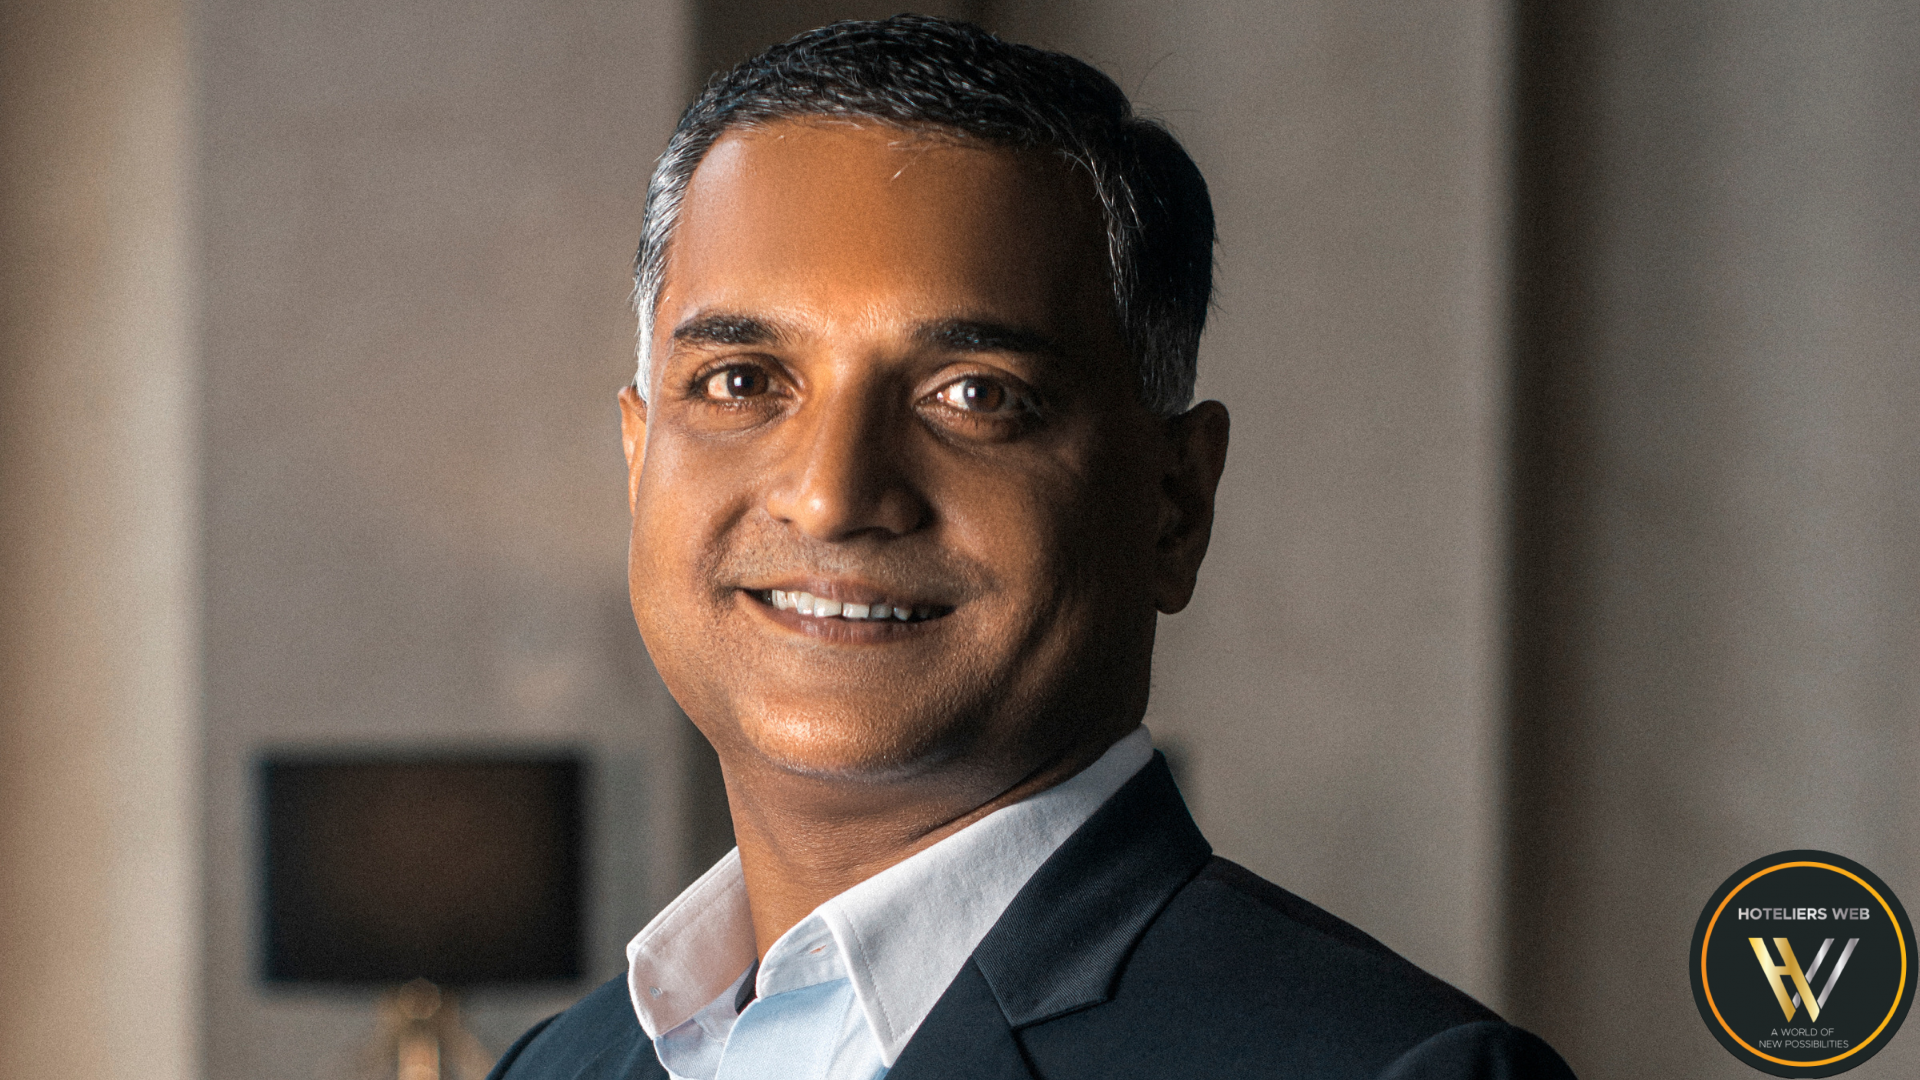 Alex Koshy Joins Radisson Blu Resort Visakhapatnam as its General Manager